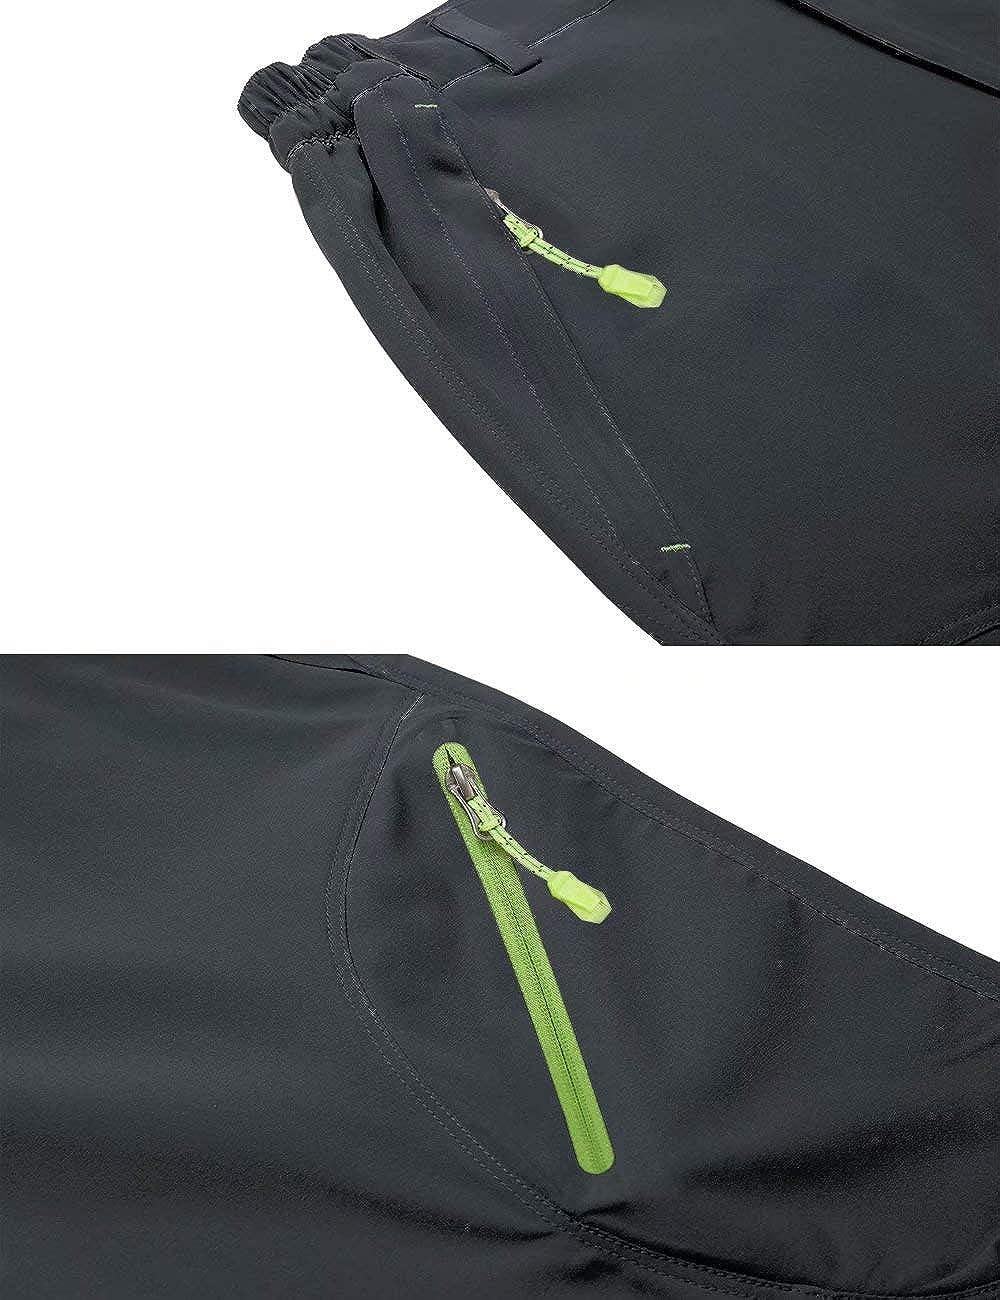 BIYLACLESEN Mens 3//4 Capri Pants Lightweight Quick Dry Hiking Shorts with 4 Zipper Pockets